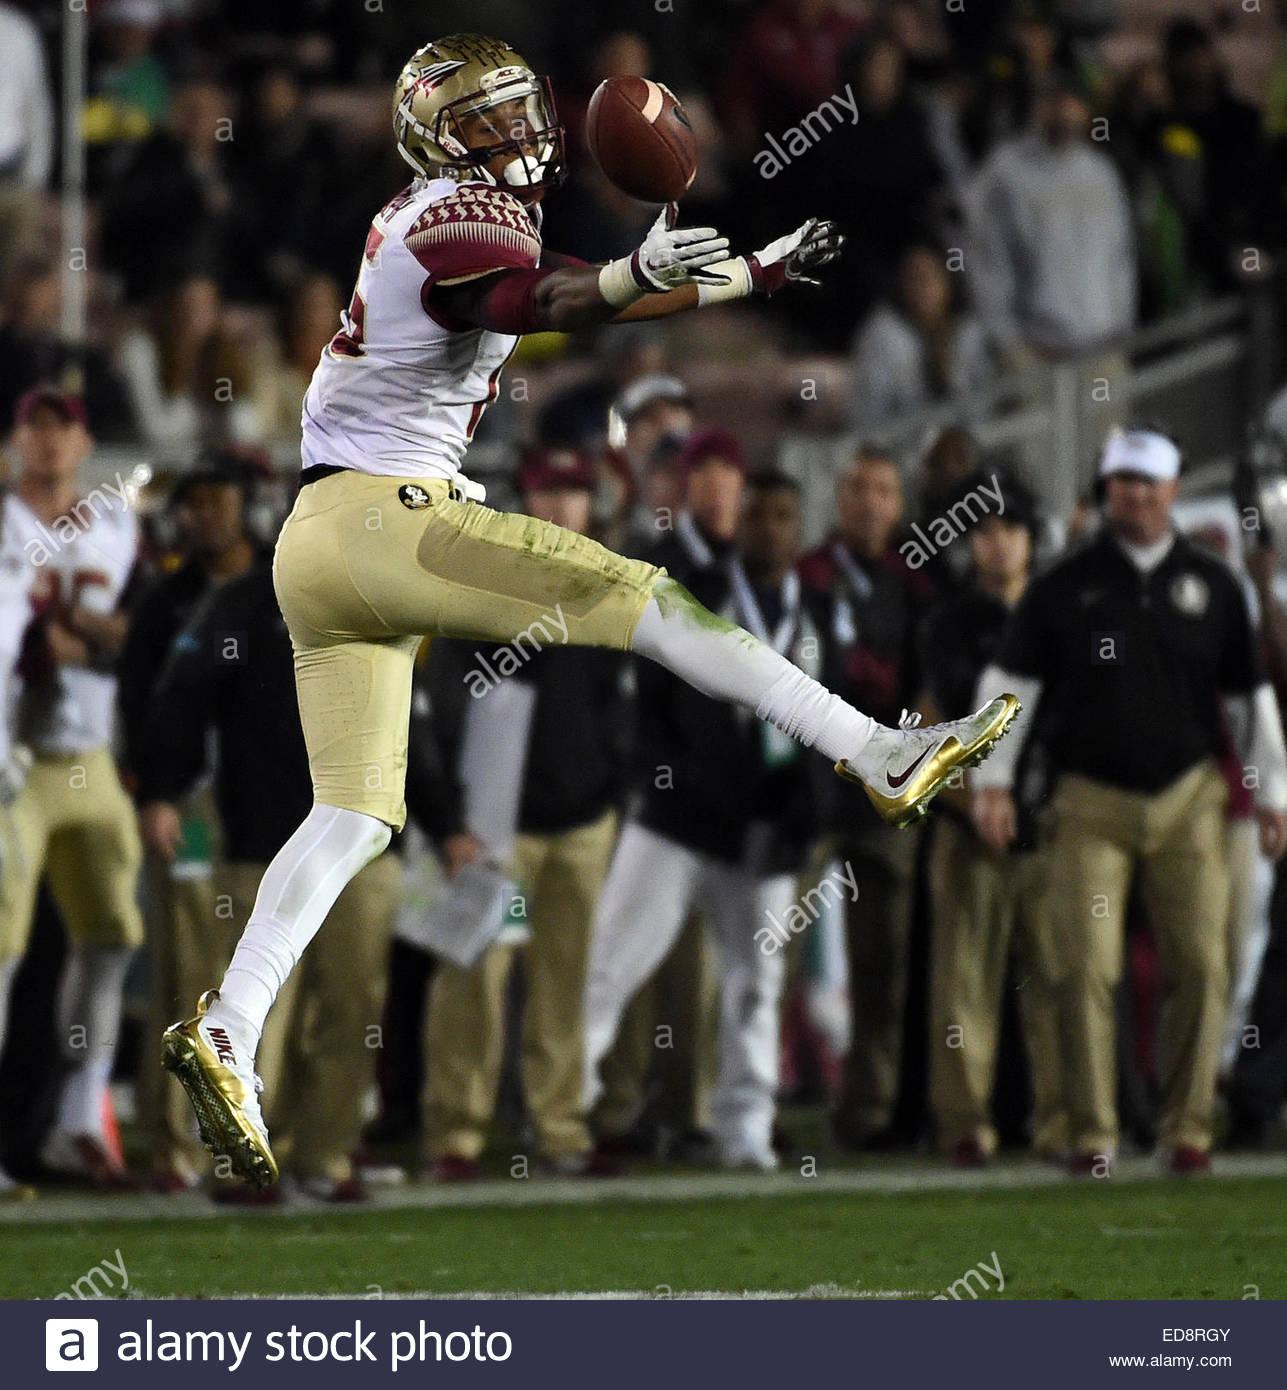 Pasadena, California, USA. 01st Jan, 2015. Florida State Seminoles wide receiver Travis Rudolph (15) drops a pass - Stock Image